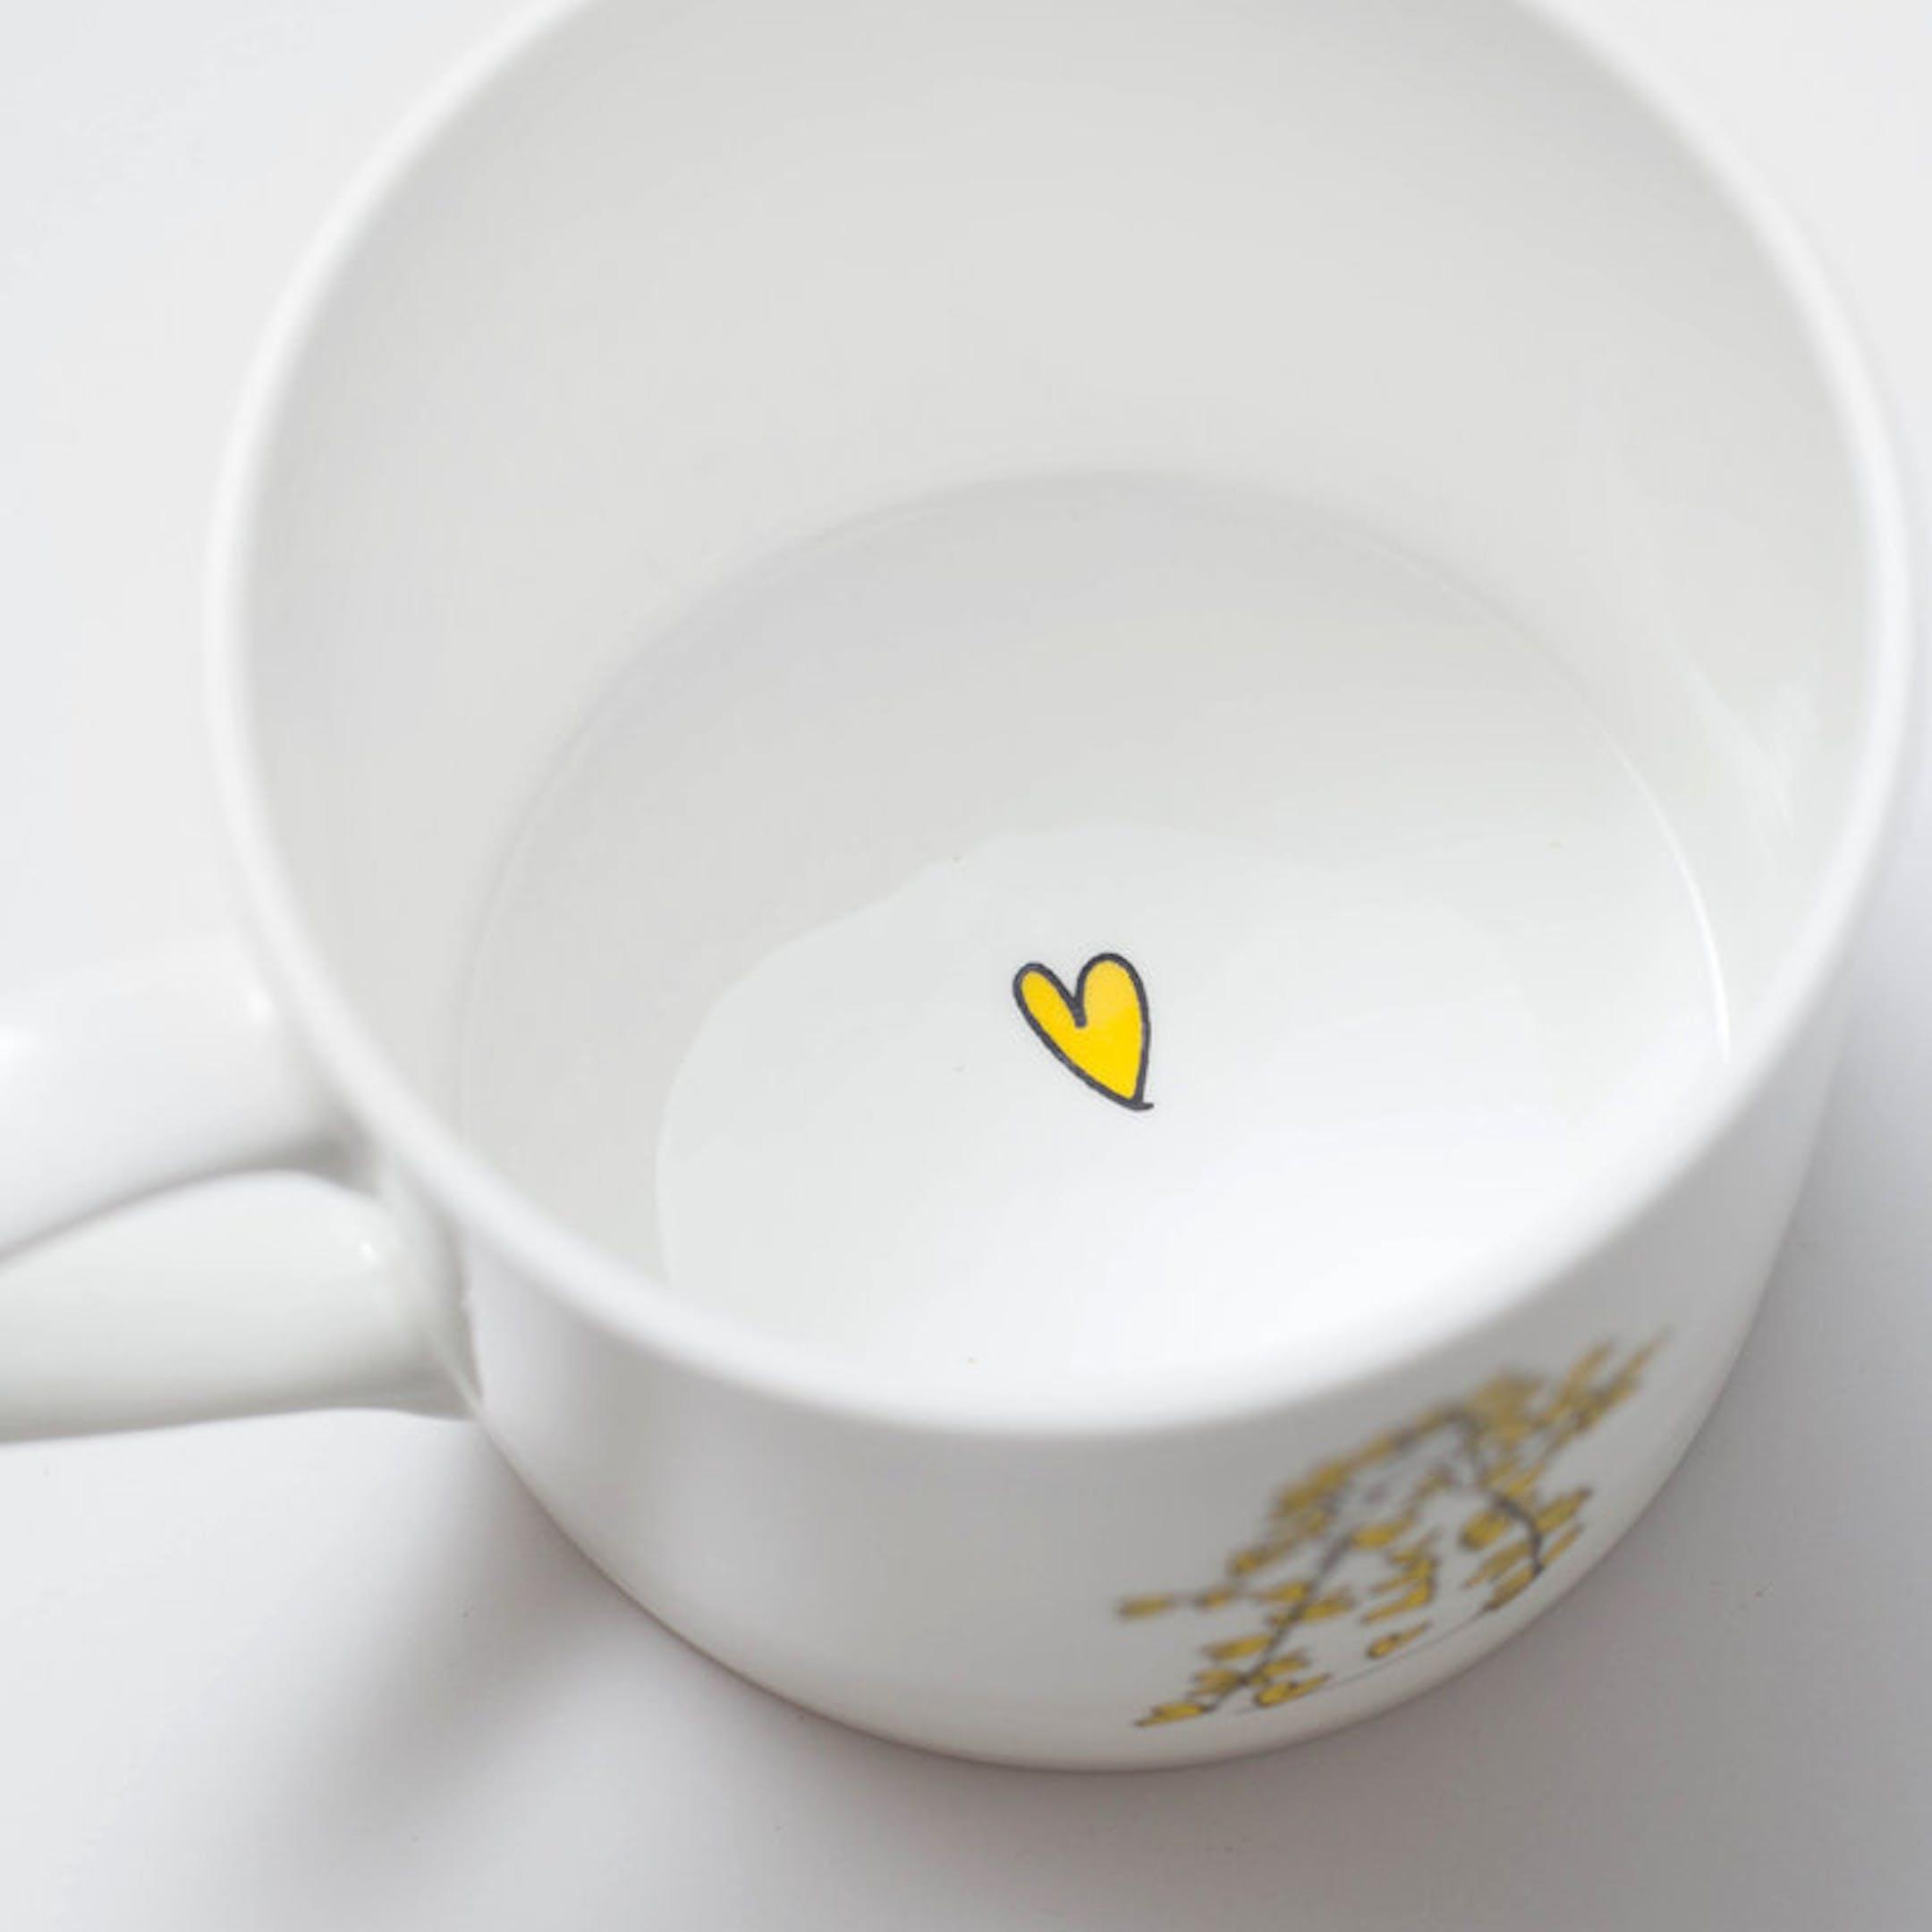 Inside of Outrageously Loved Mug - SMT